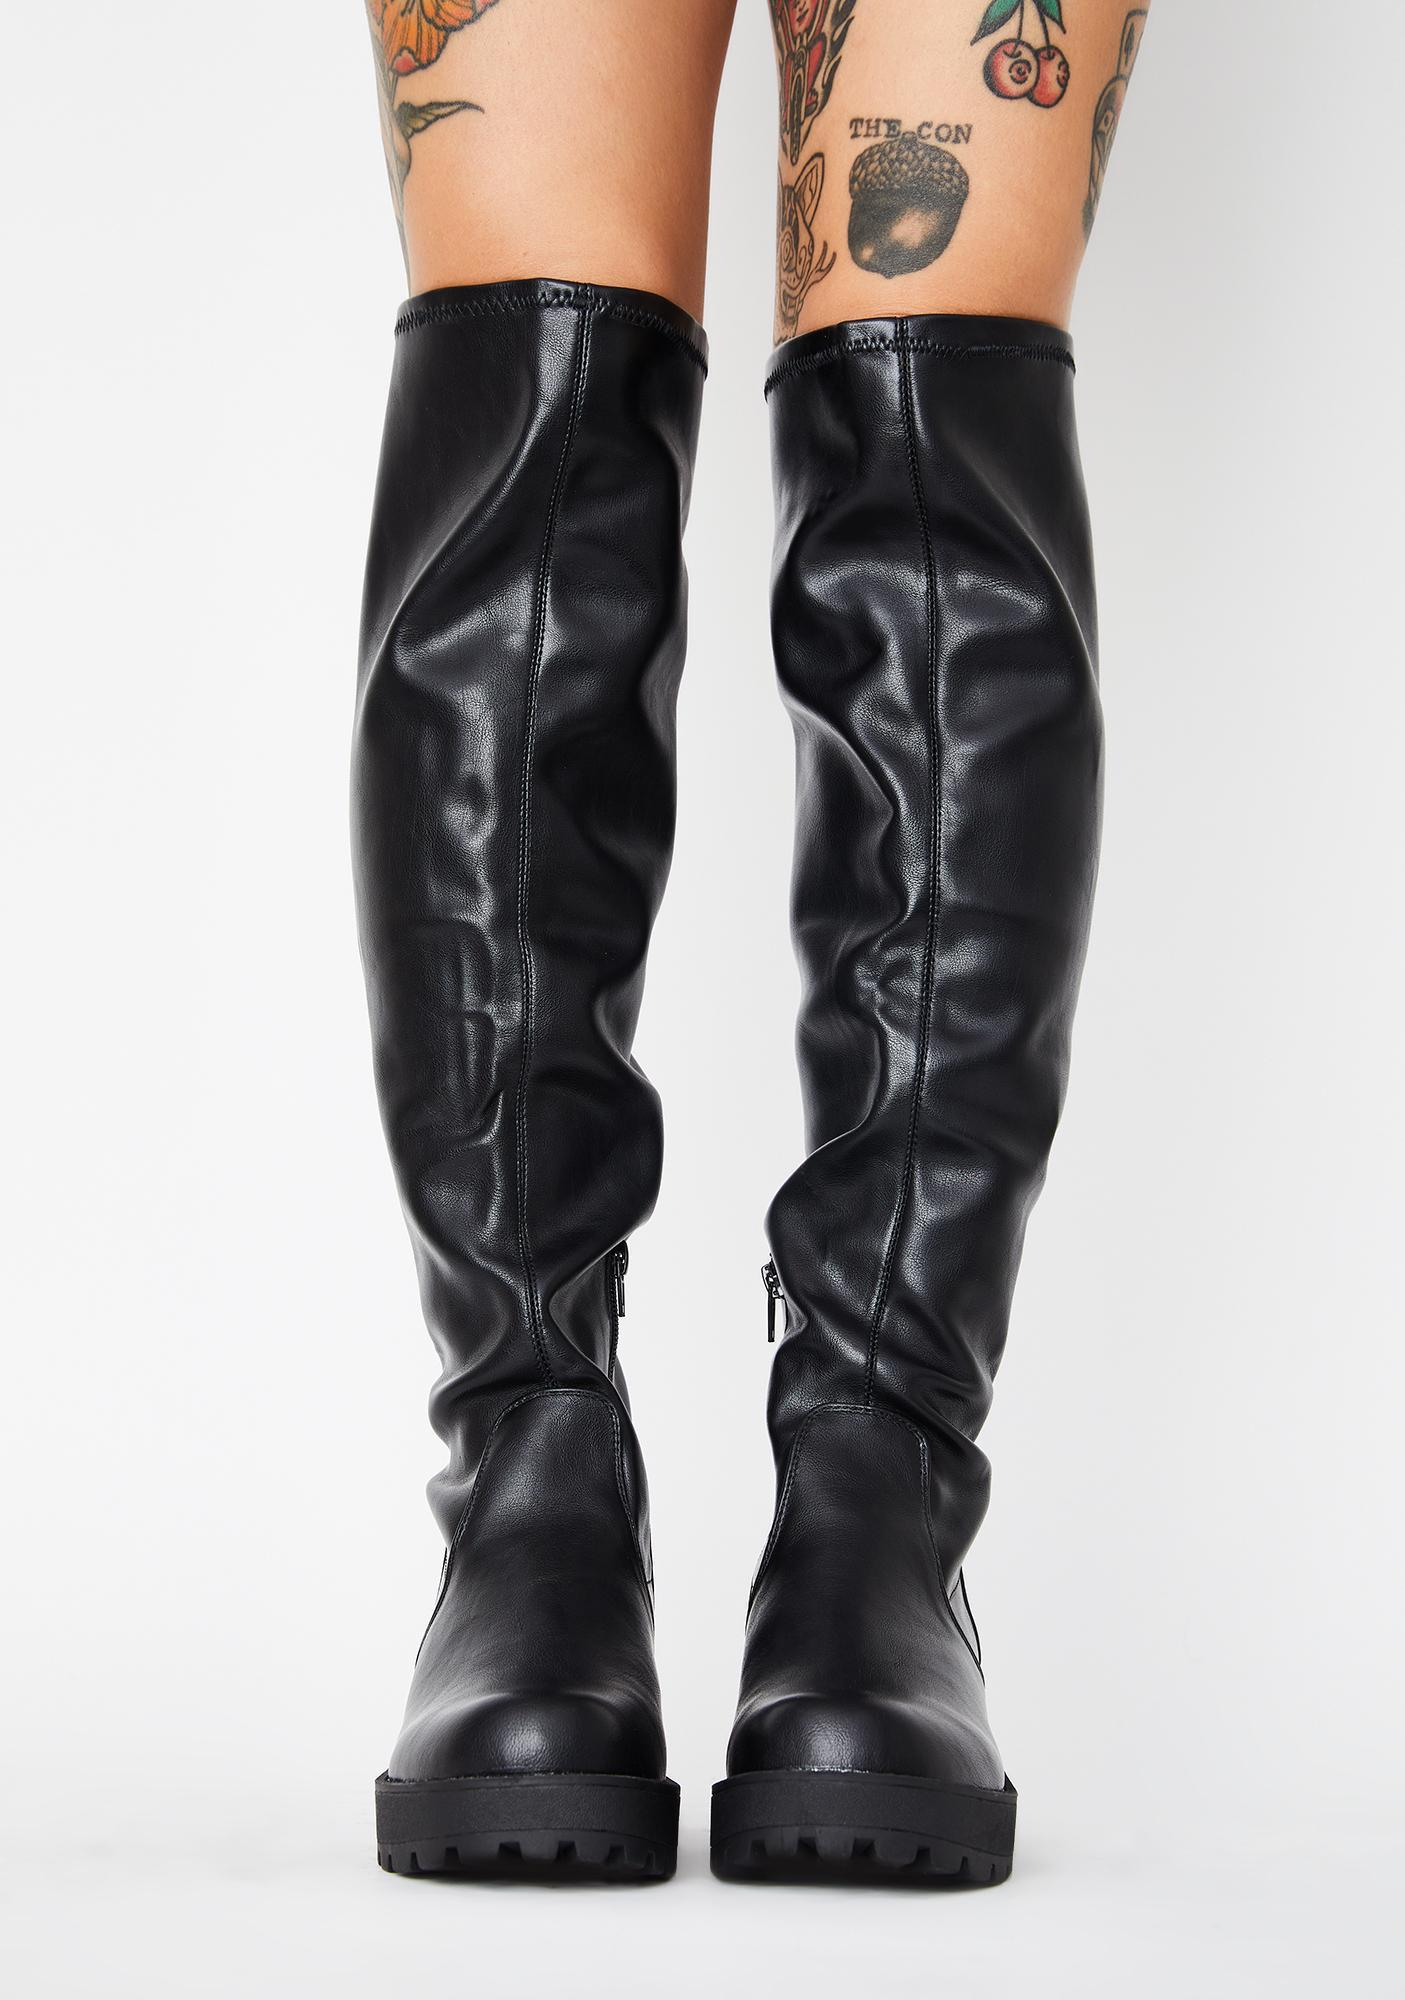 Lust For Life PU Passport Knee High Boots